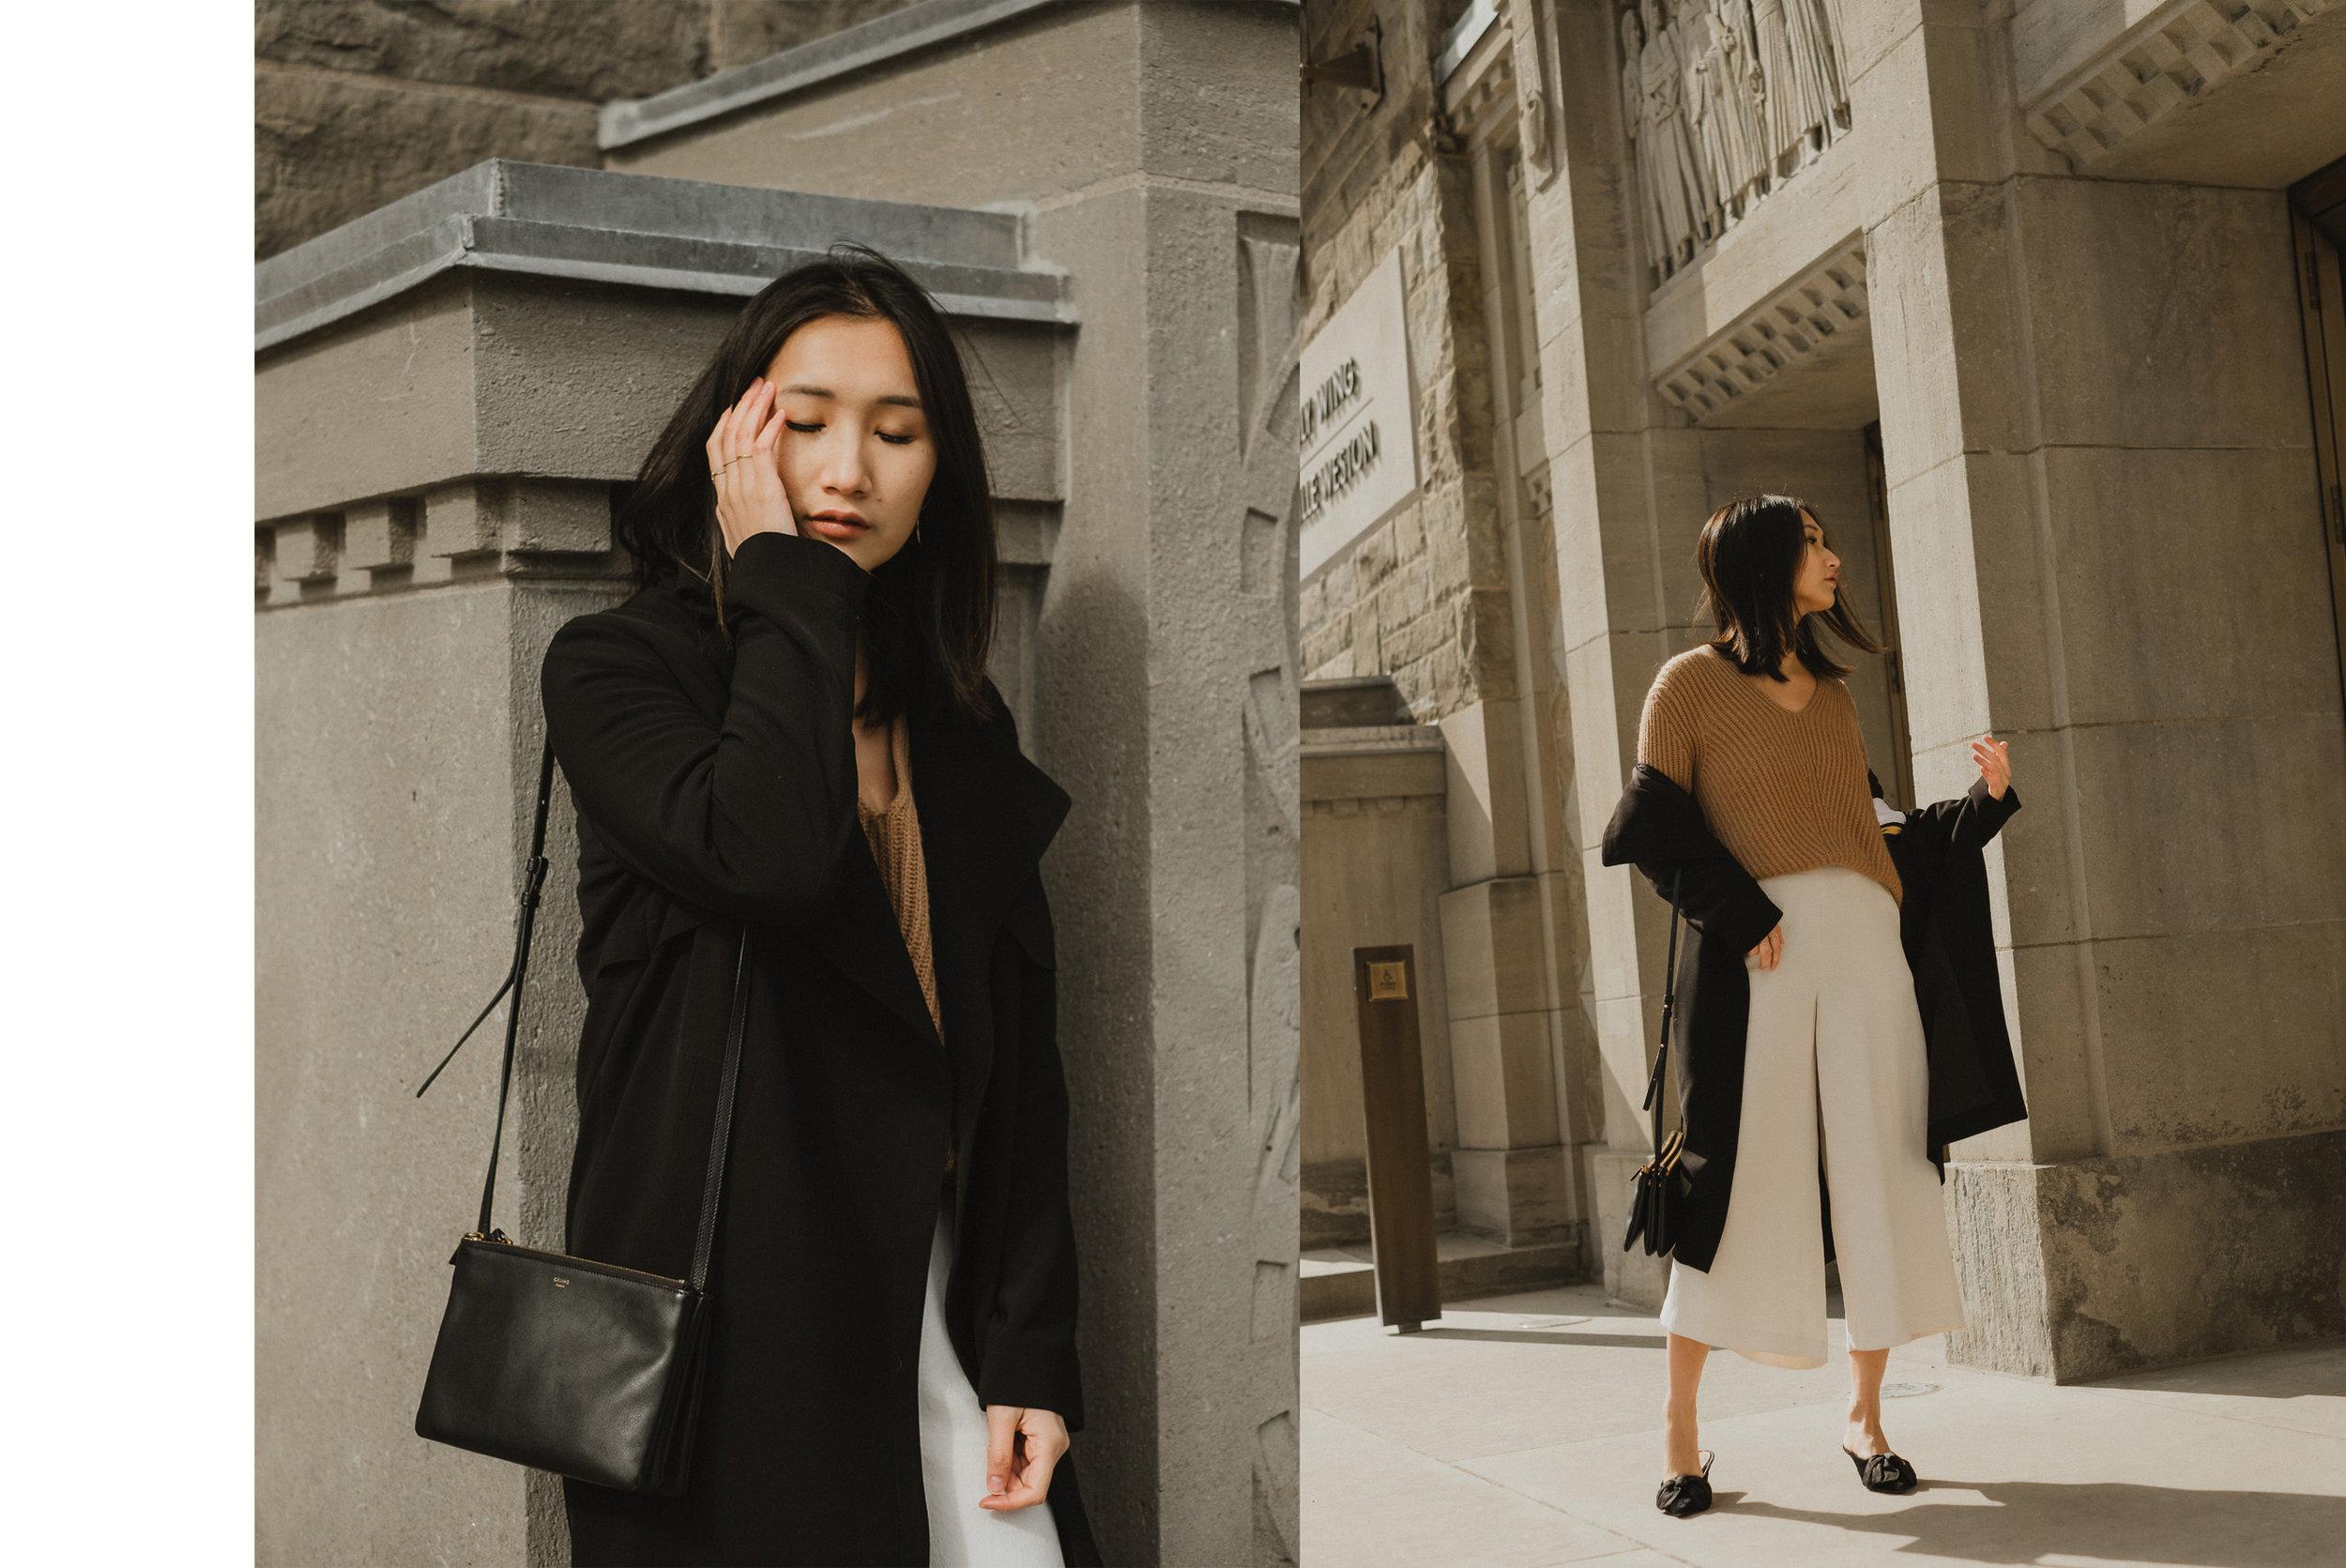 black-duster-coat-spring